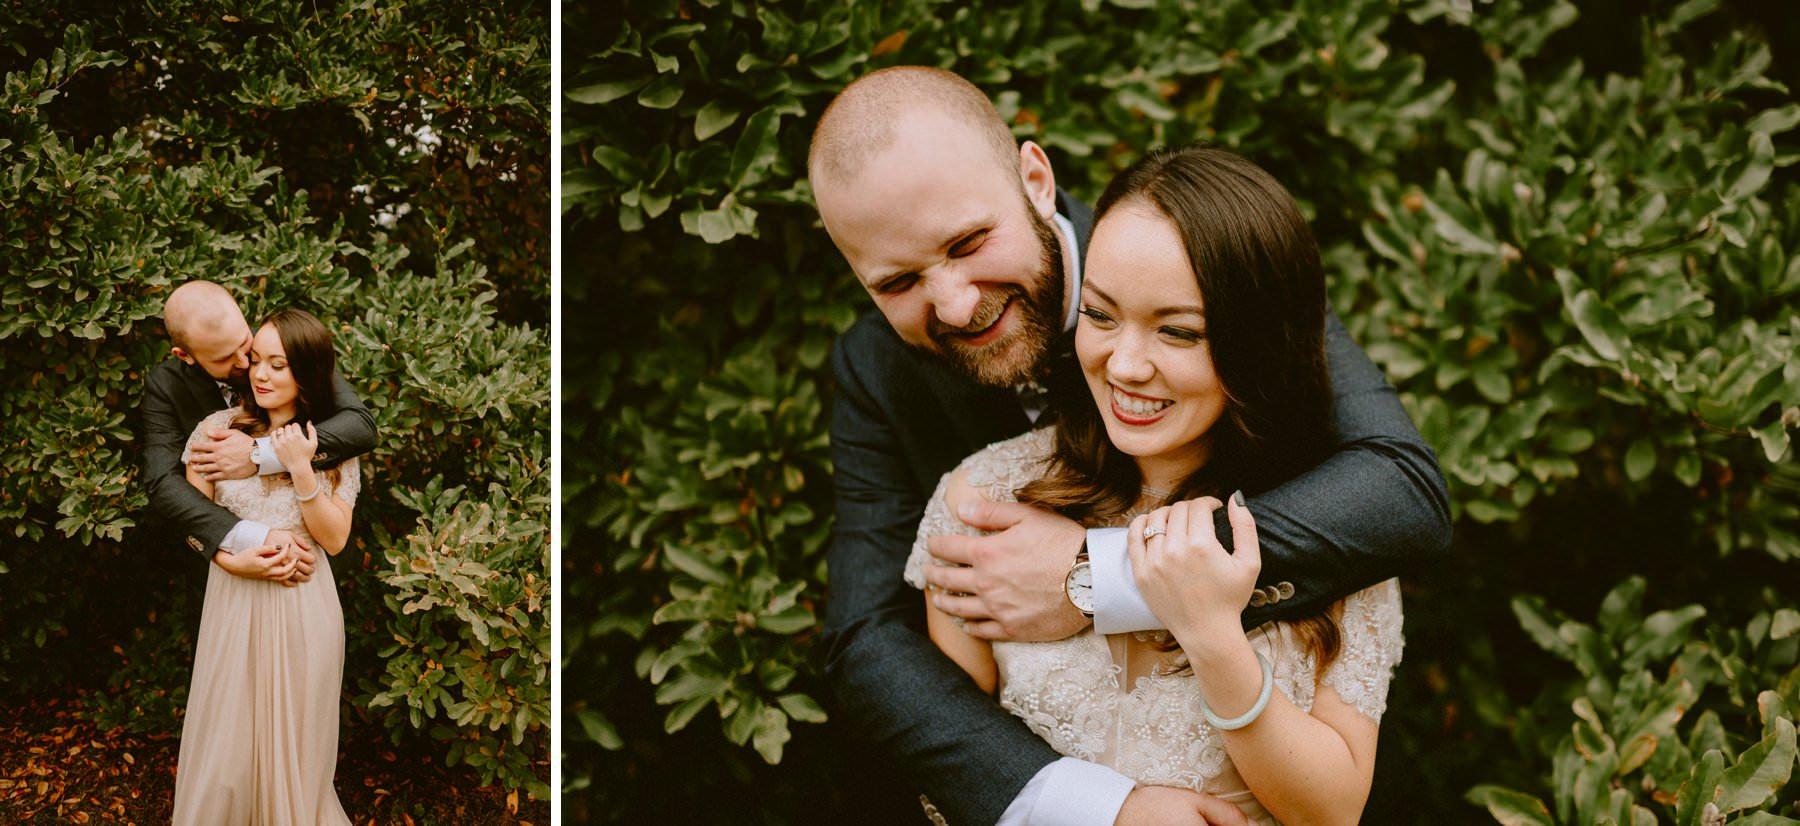 Tyler_arboretum_wedding-040.jpg